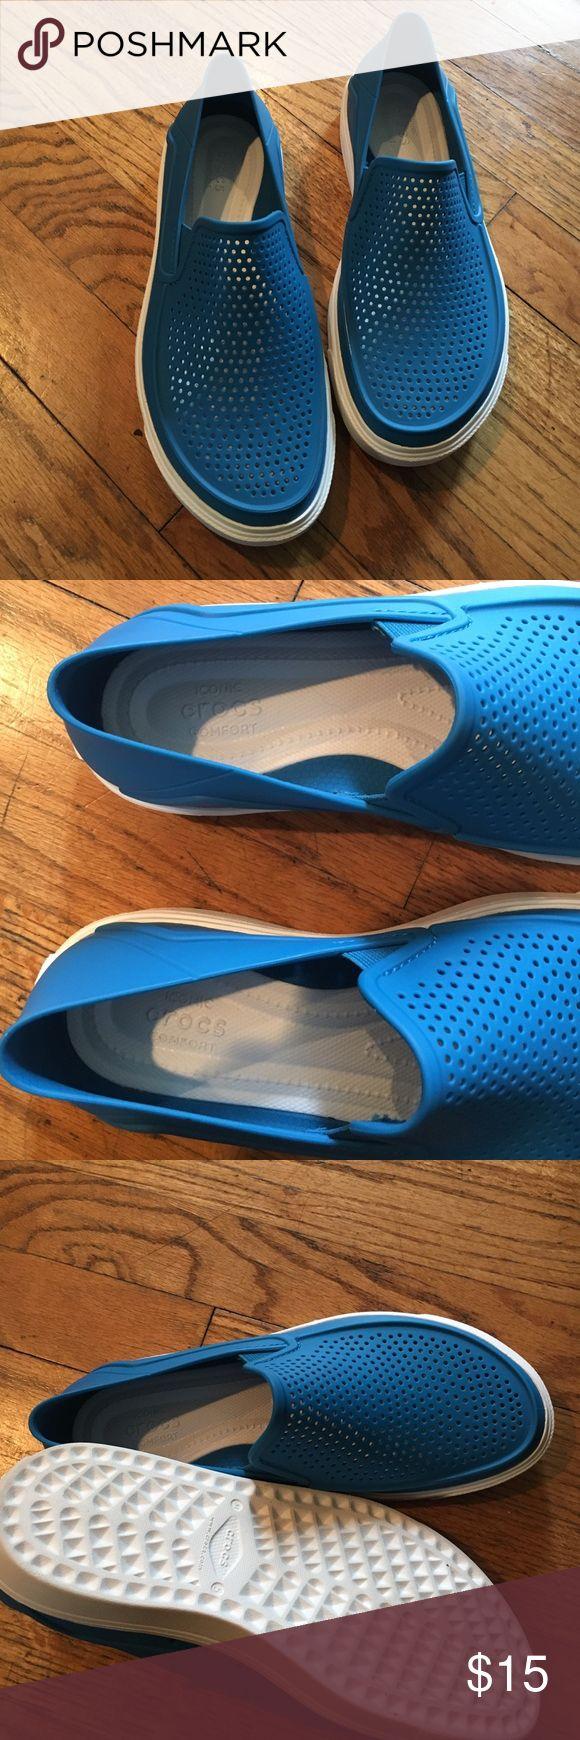 Crocs shoes brand new no tags woman's size5M Brand new never worn crocs plastic shoe CROCS Shoes